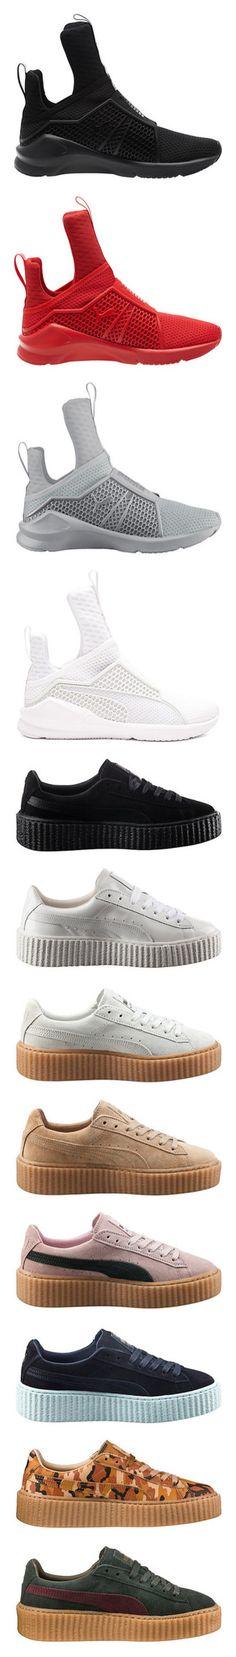 4d7f3255f708ea  Fenty X Puma by princess-kiana ❤ liked on Polyvore featuring shoes